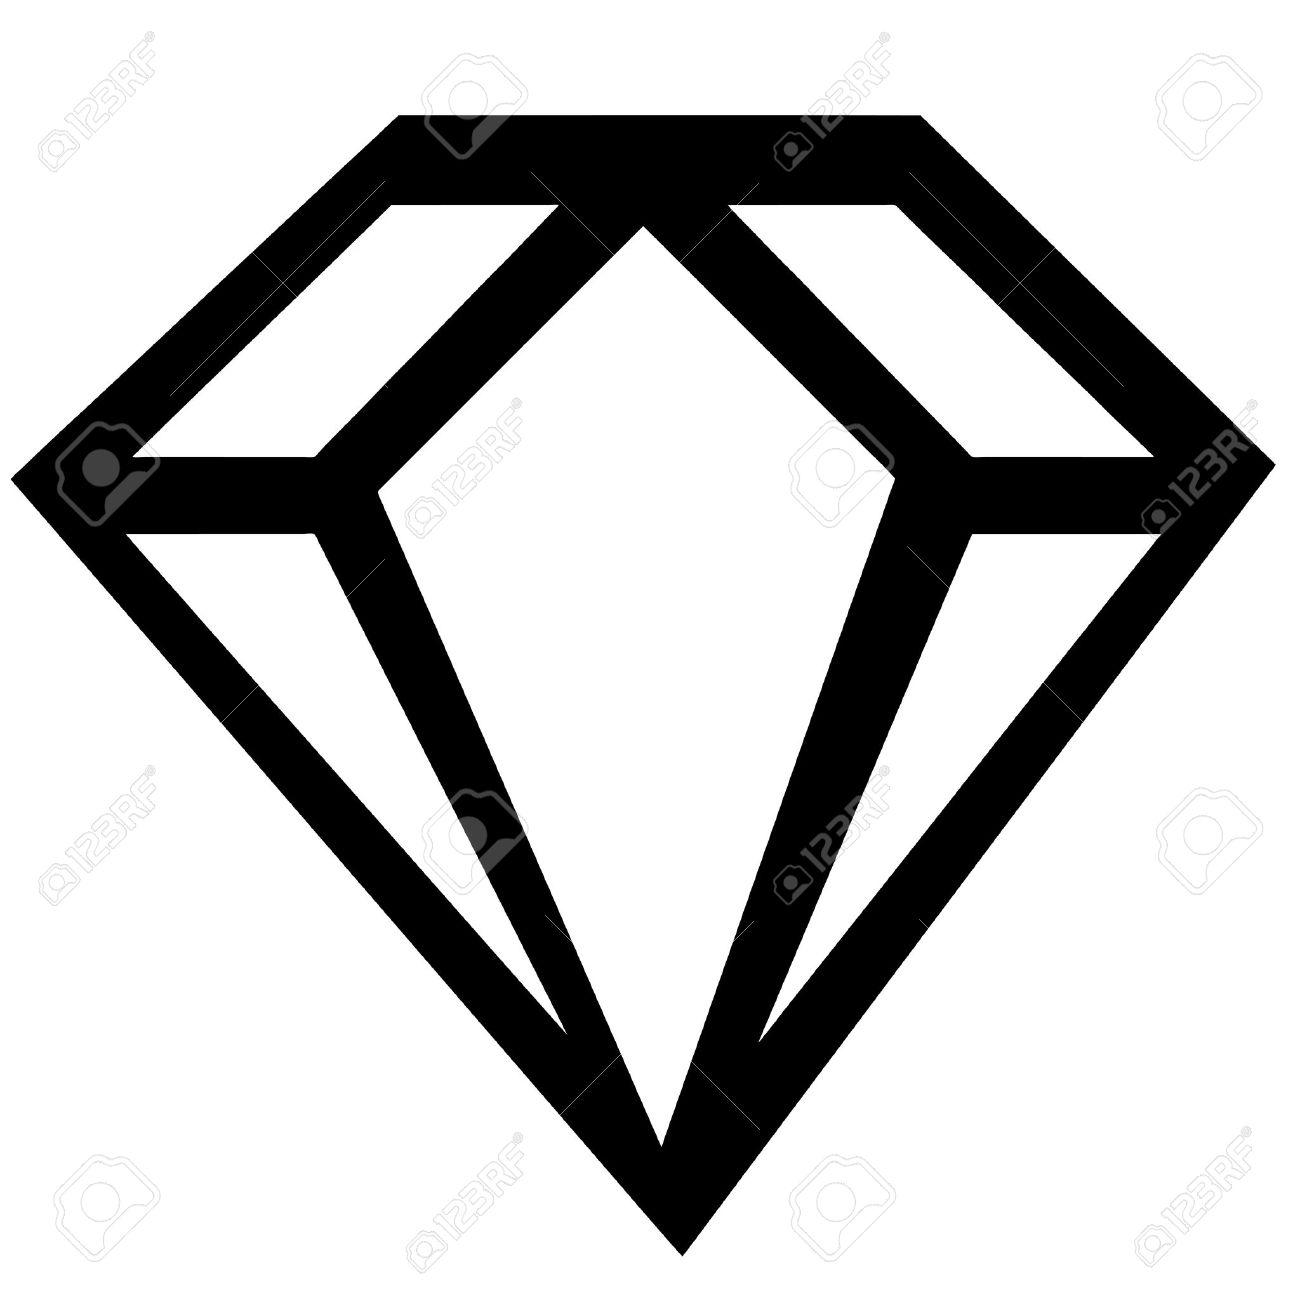 diamond sign Stock Vector - 4851867